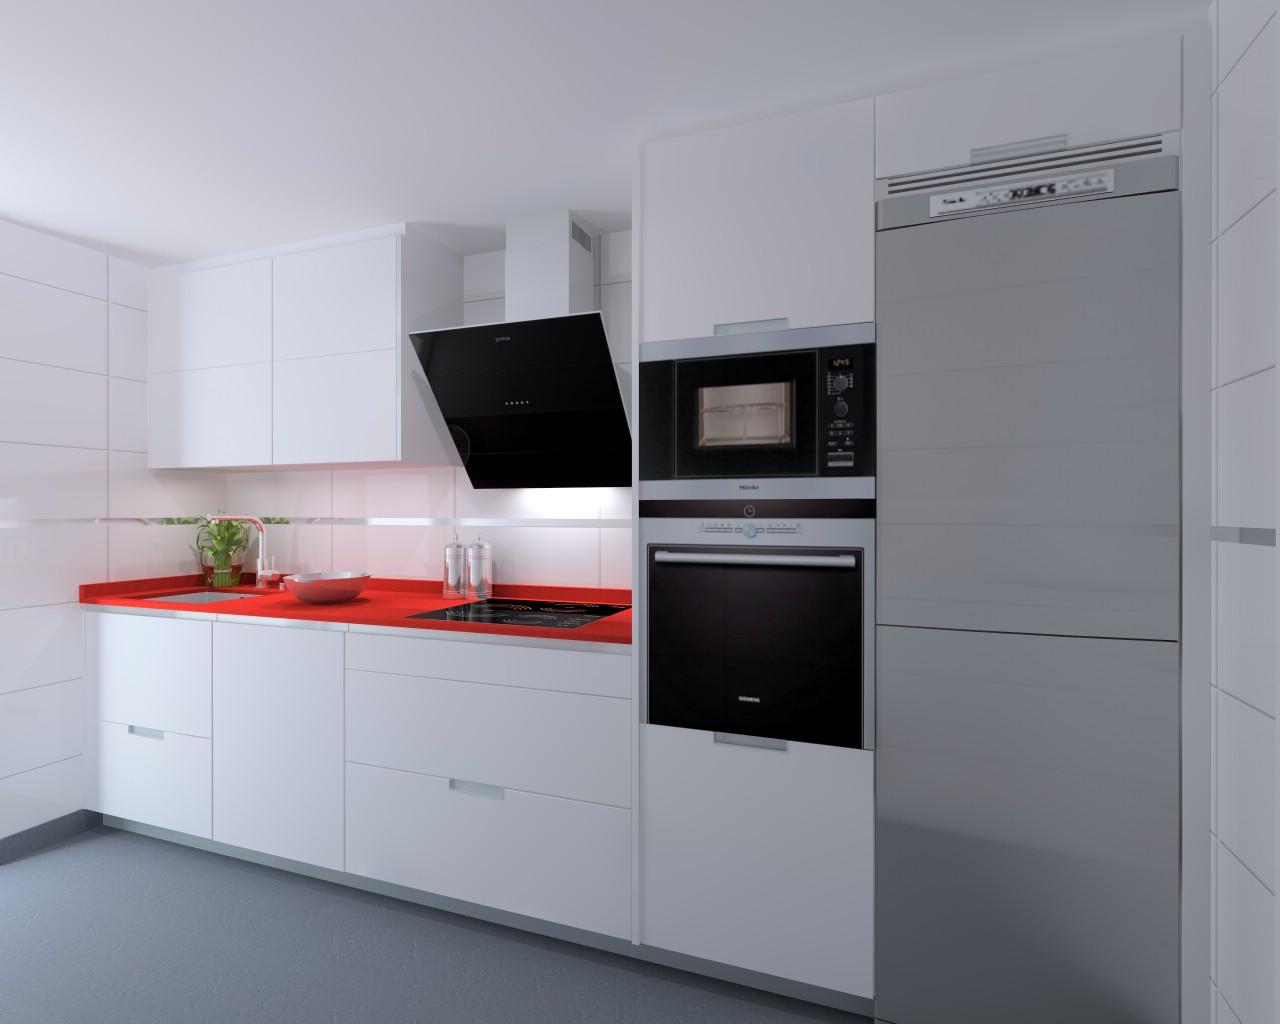 Madrid cocina santos modelo minos e encimera compac for Encimera auxiliar cocina